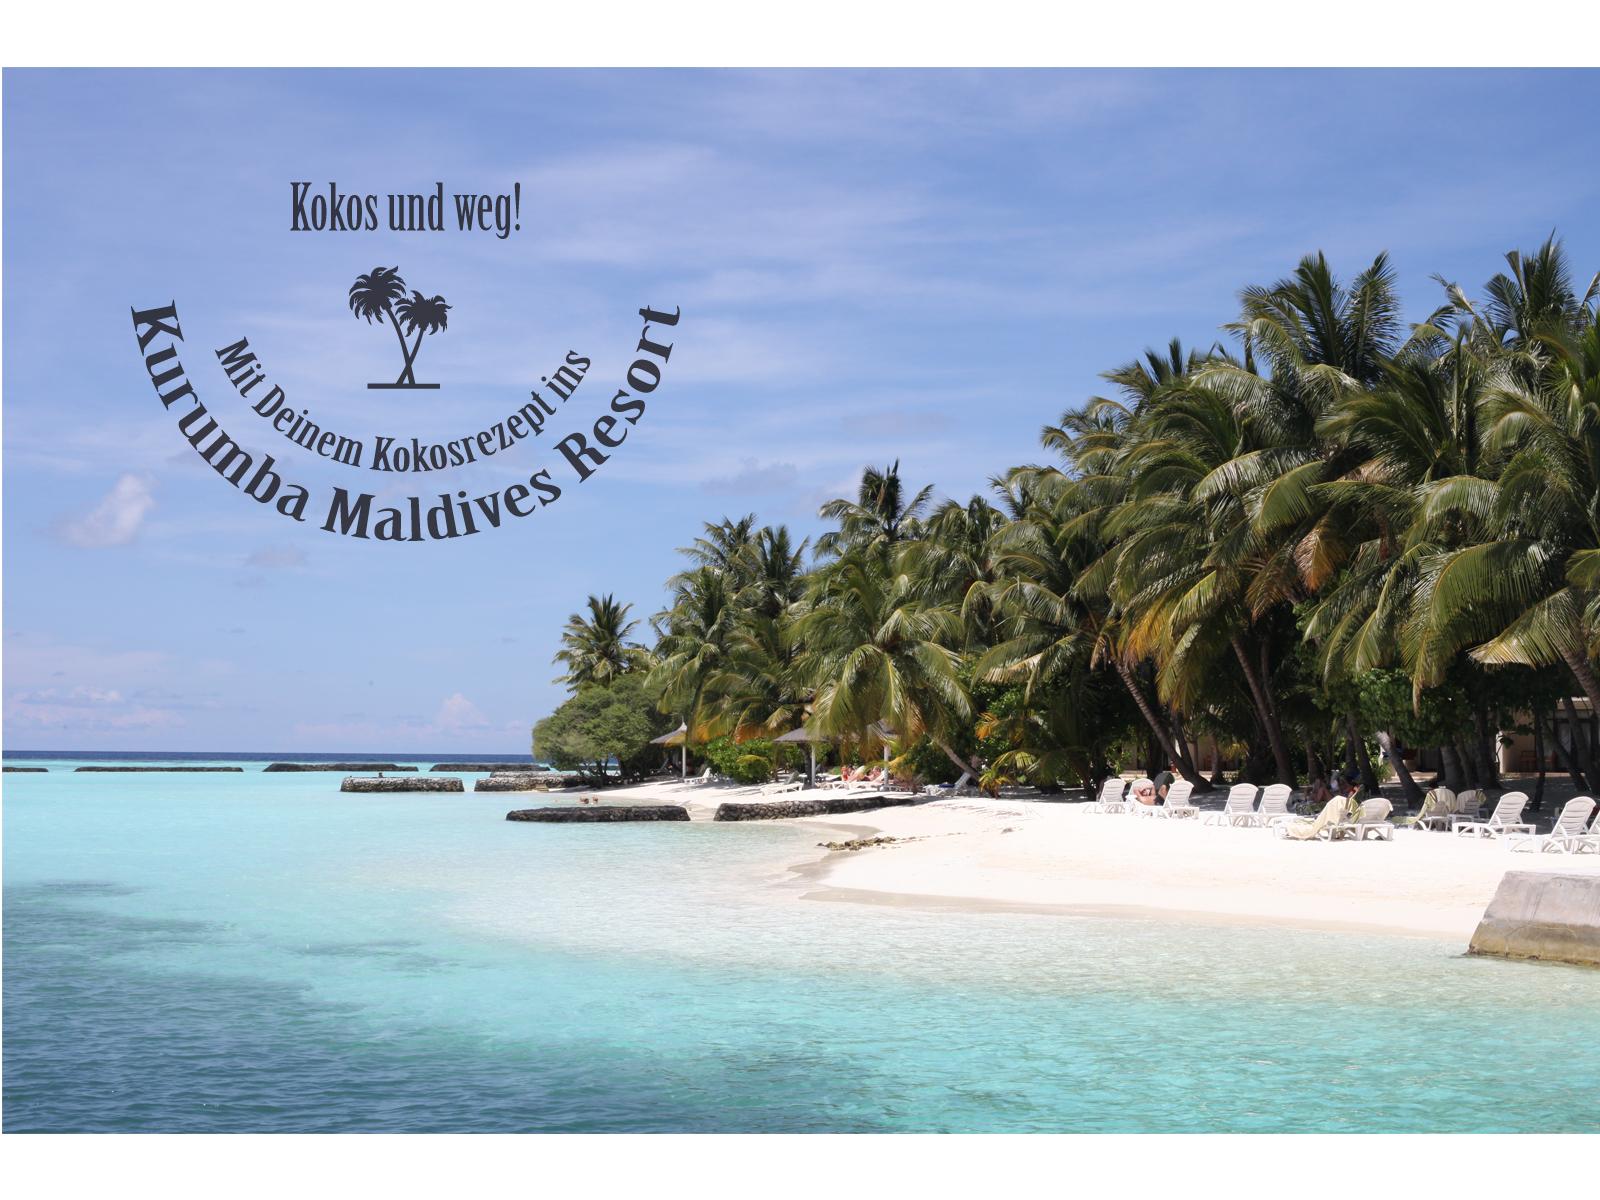 Kurumba Maldives Gewinnspiel zuckerzimtundliebe Kokosnuss Rezepte gesucht